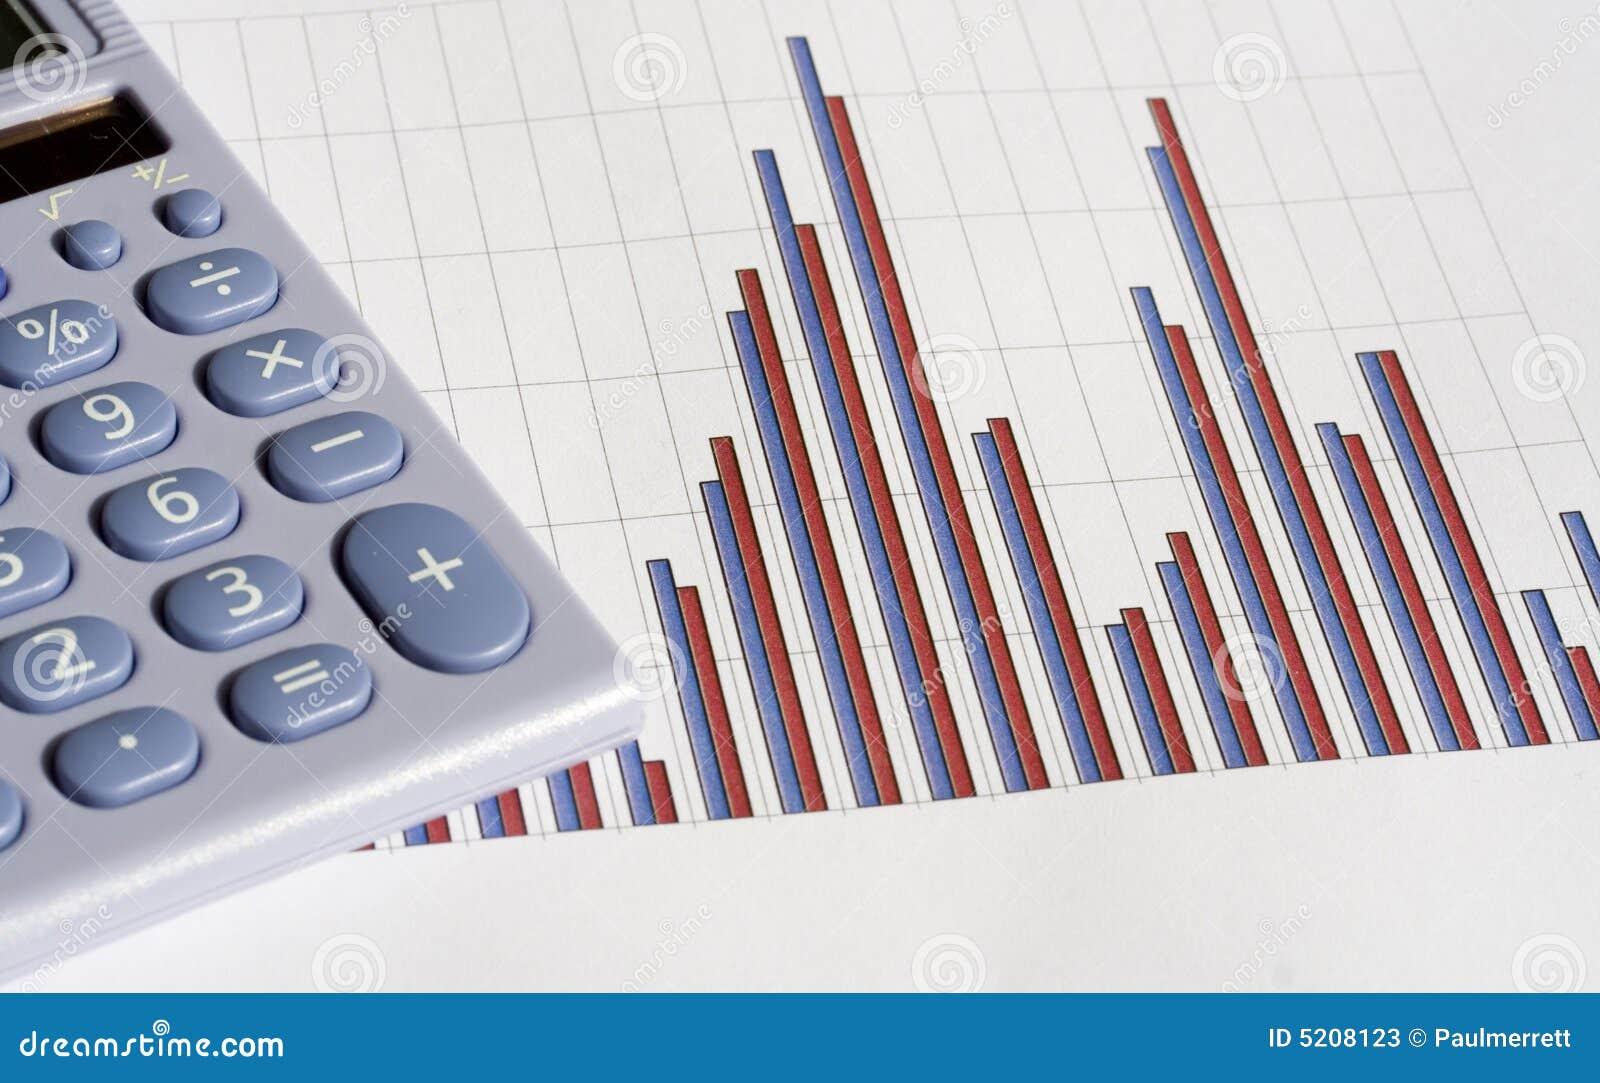 Calculator and bar chart stock image image of office 5208123 calculator and bar chart ccuart Image collections